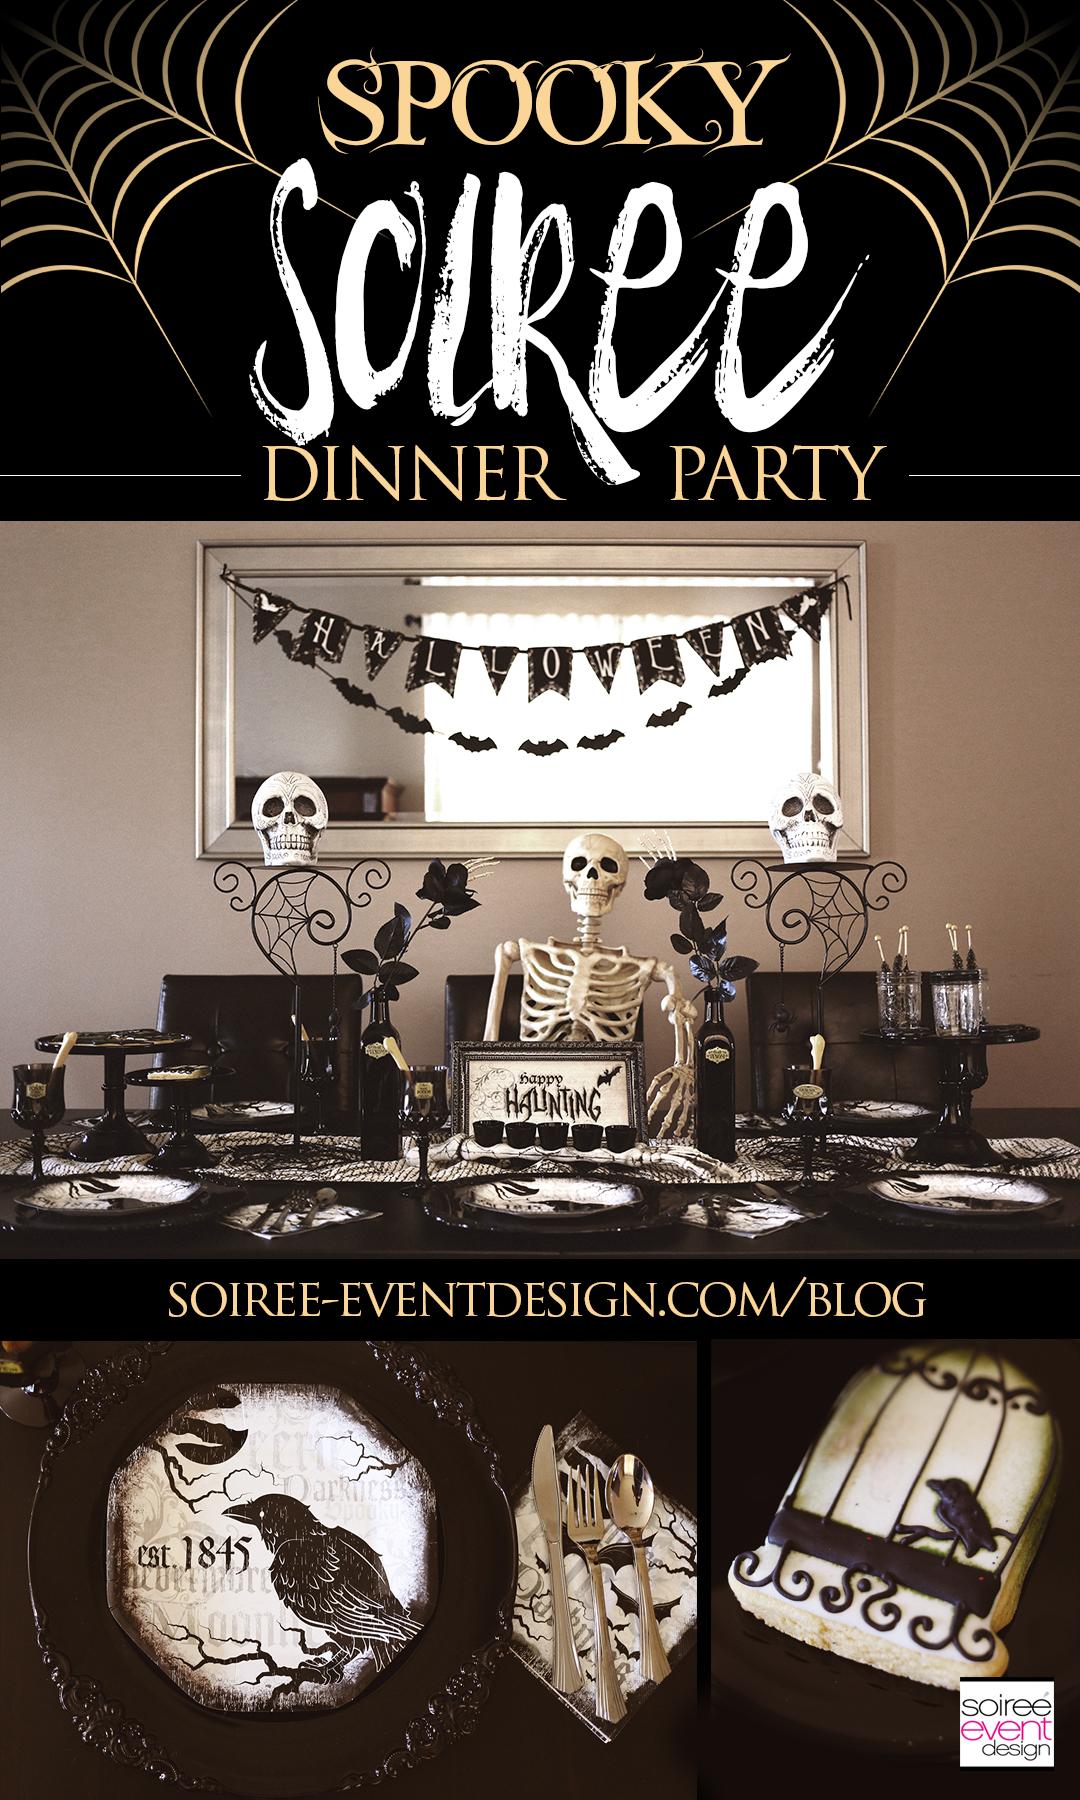 spooky-soiree-halloween-party